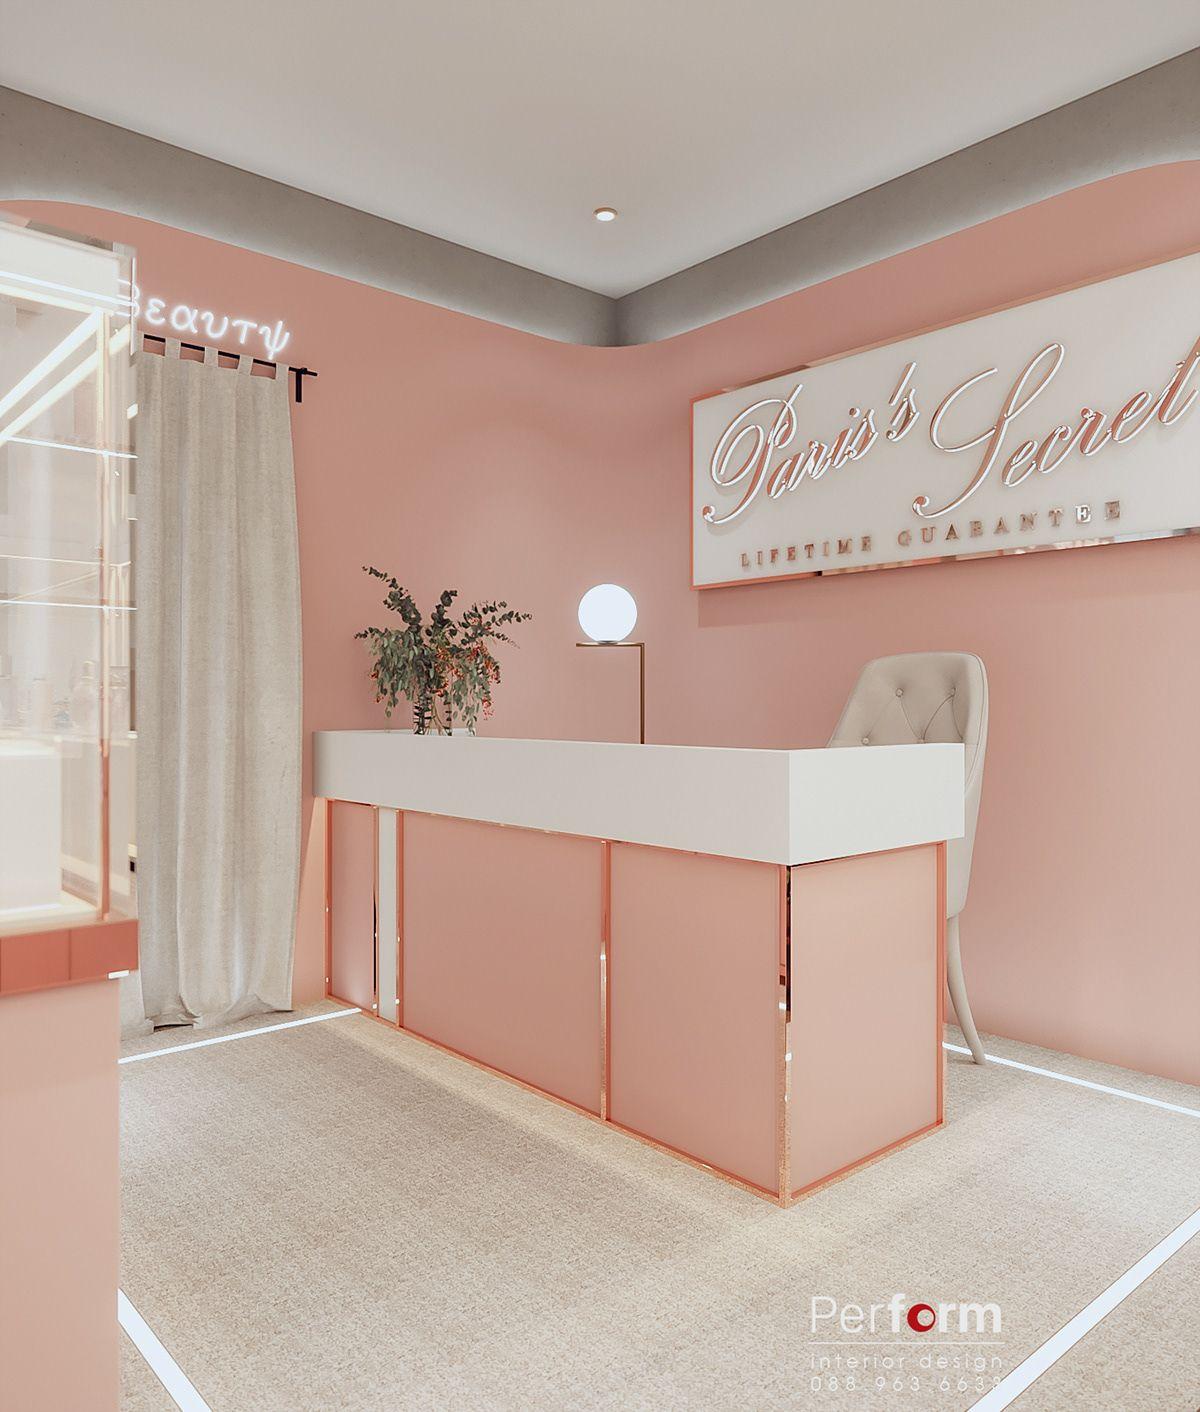 Perfume shop luxury